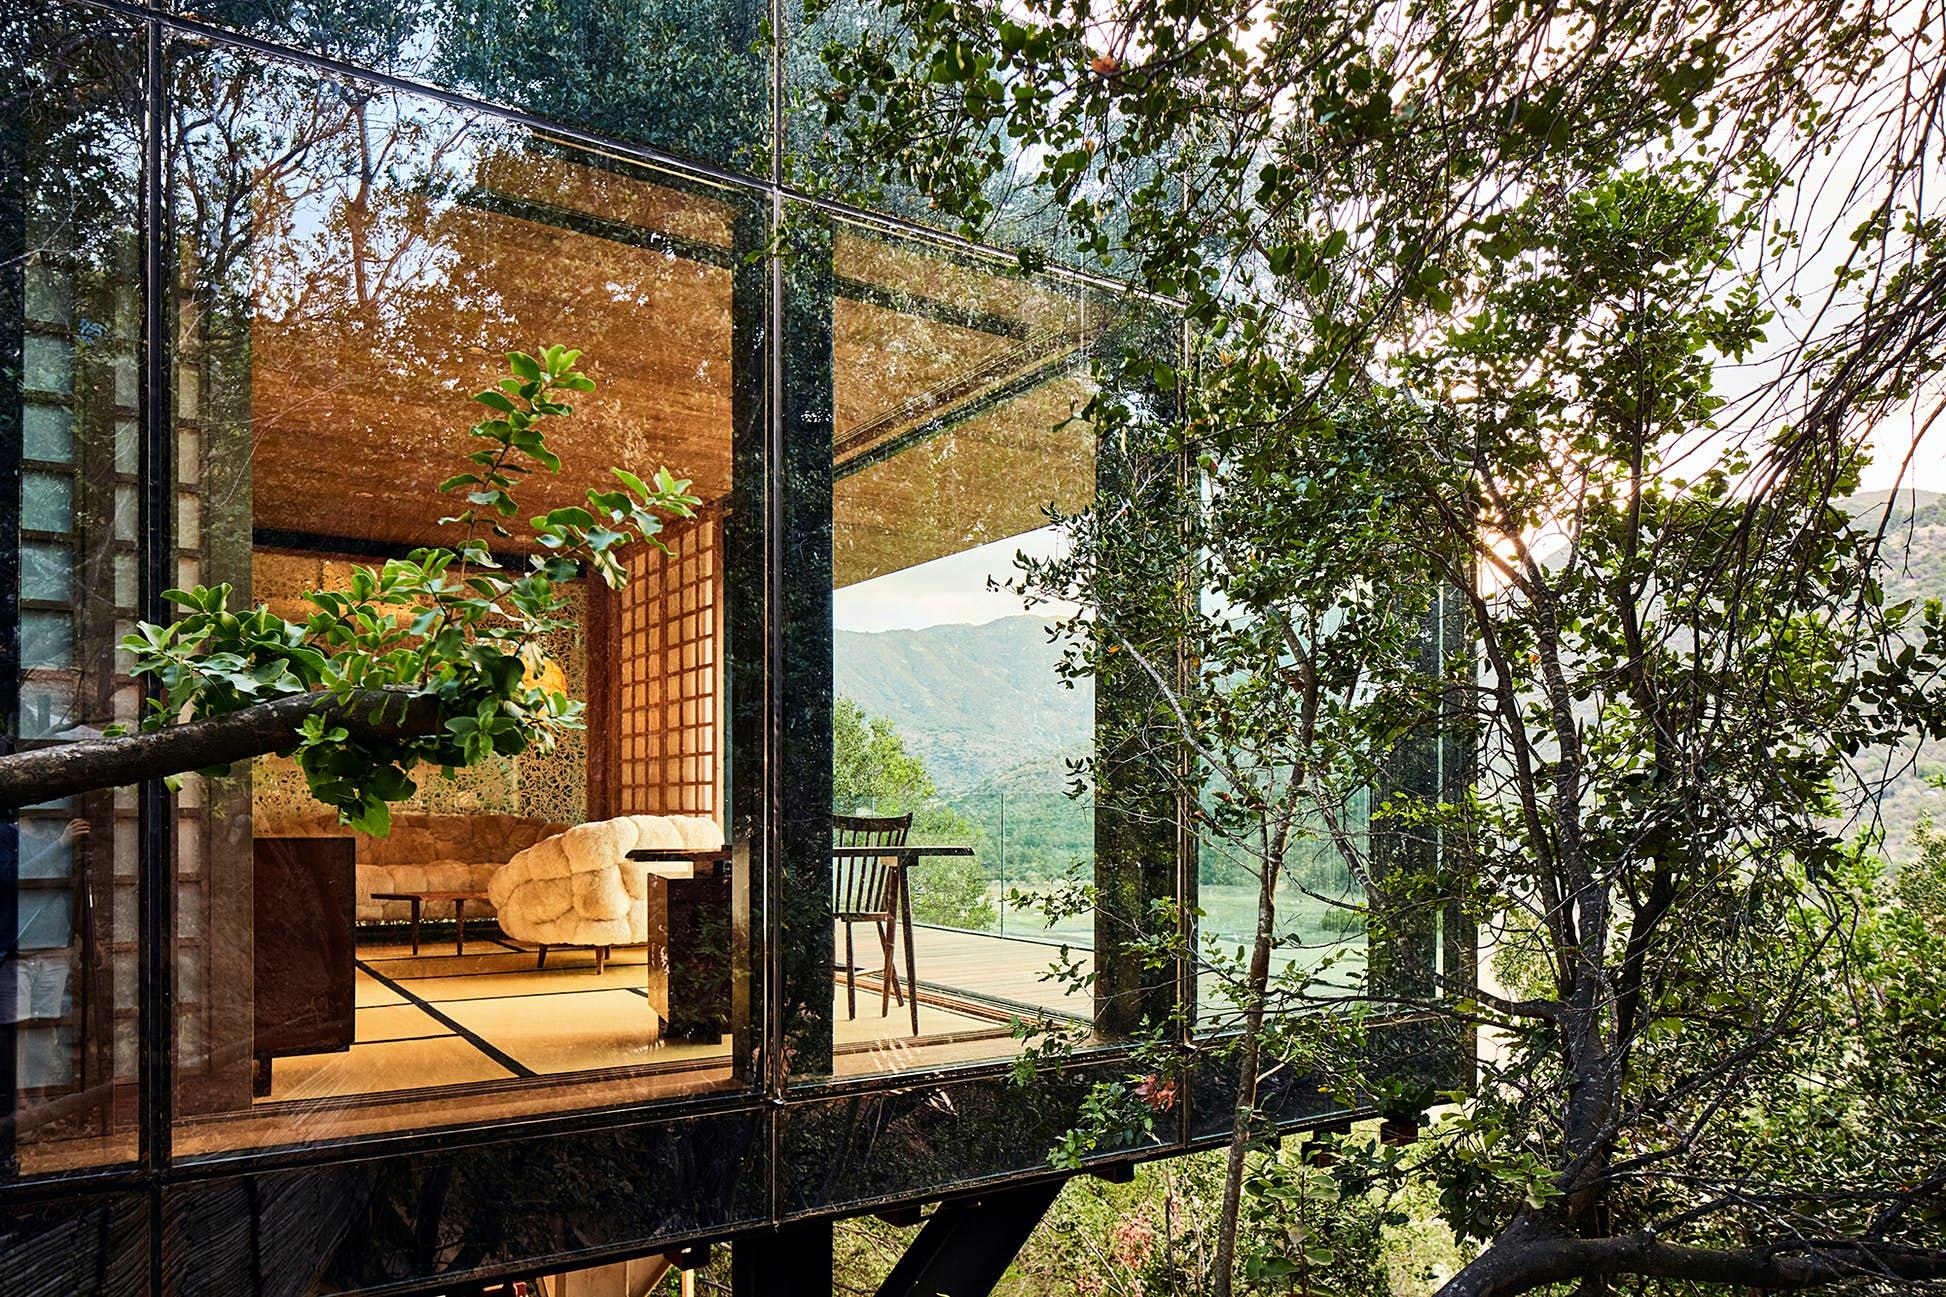 Award-winning vineyard Viña Vik has accommodations that make the most of its surroundings @ Courtesy of Puro Vik